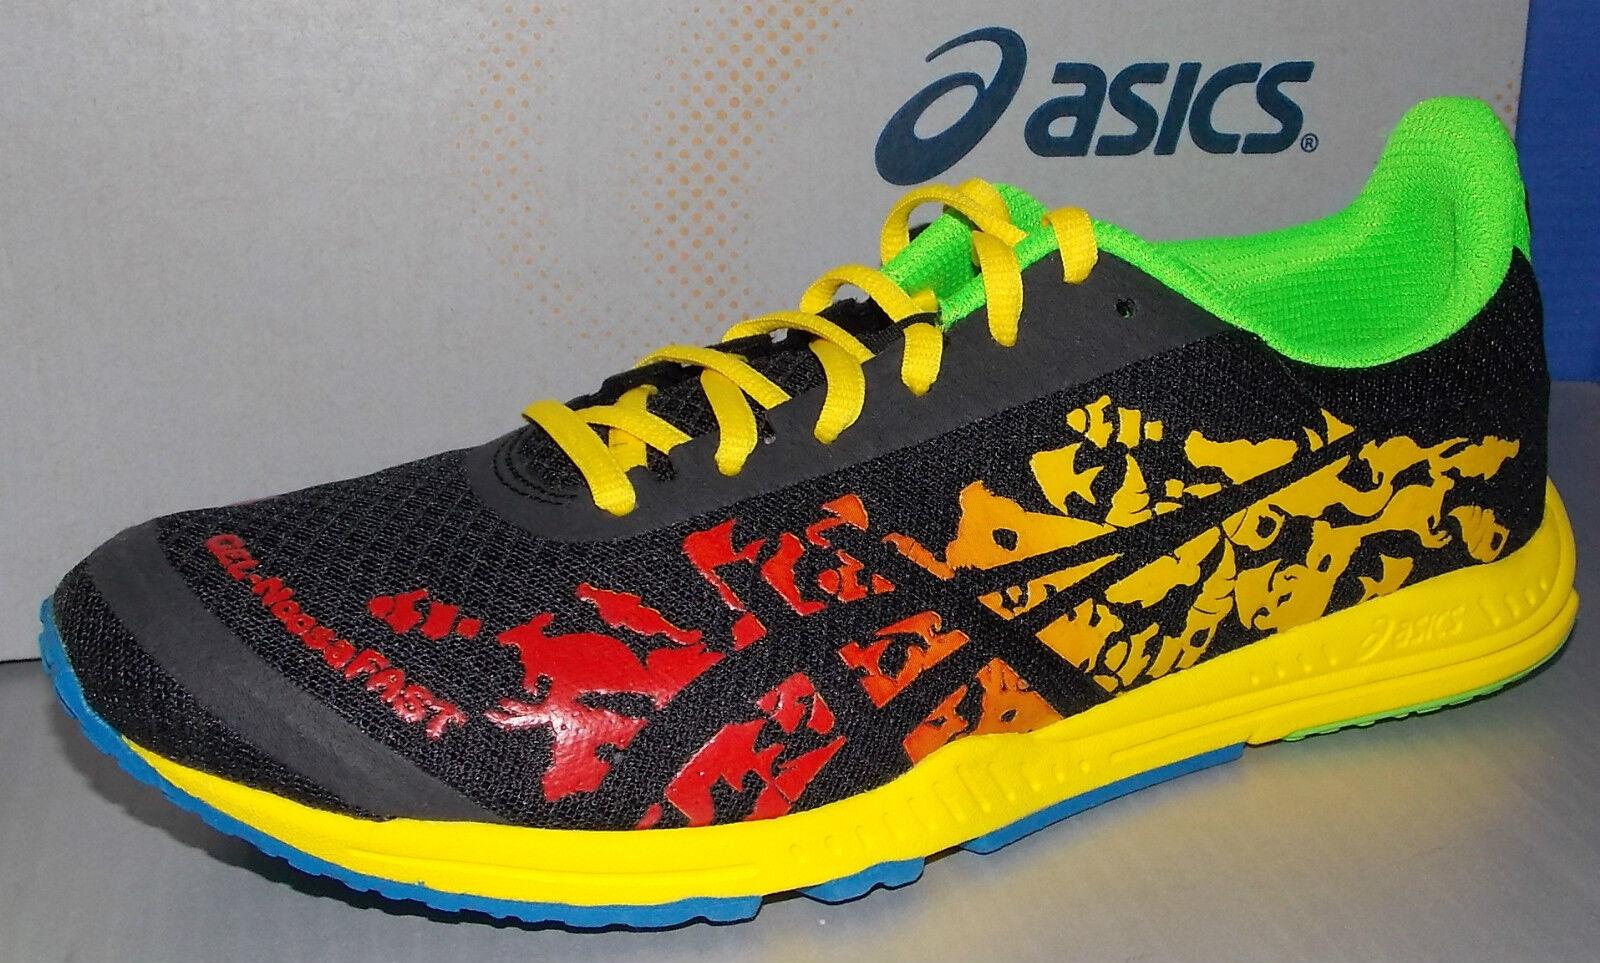 Mens Asics Gel-noosafast en Colors llama Negro amarillo Tamaño 8.5